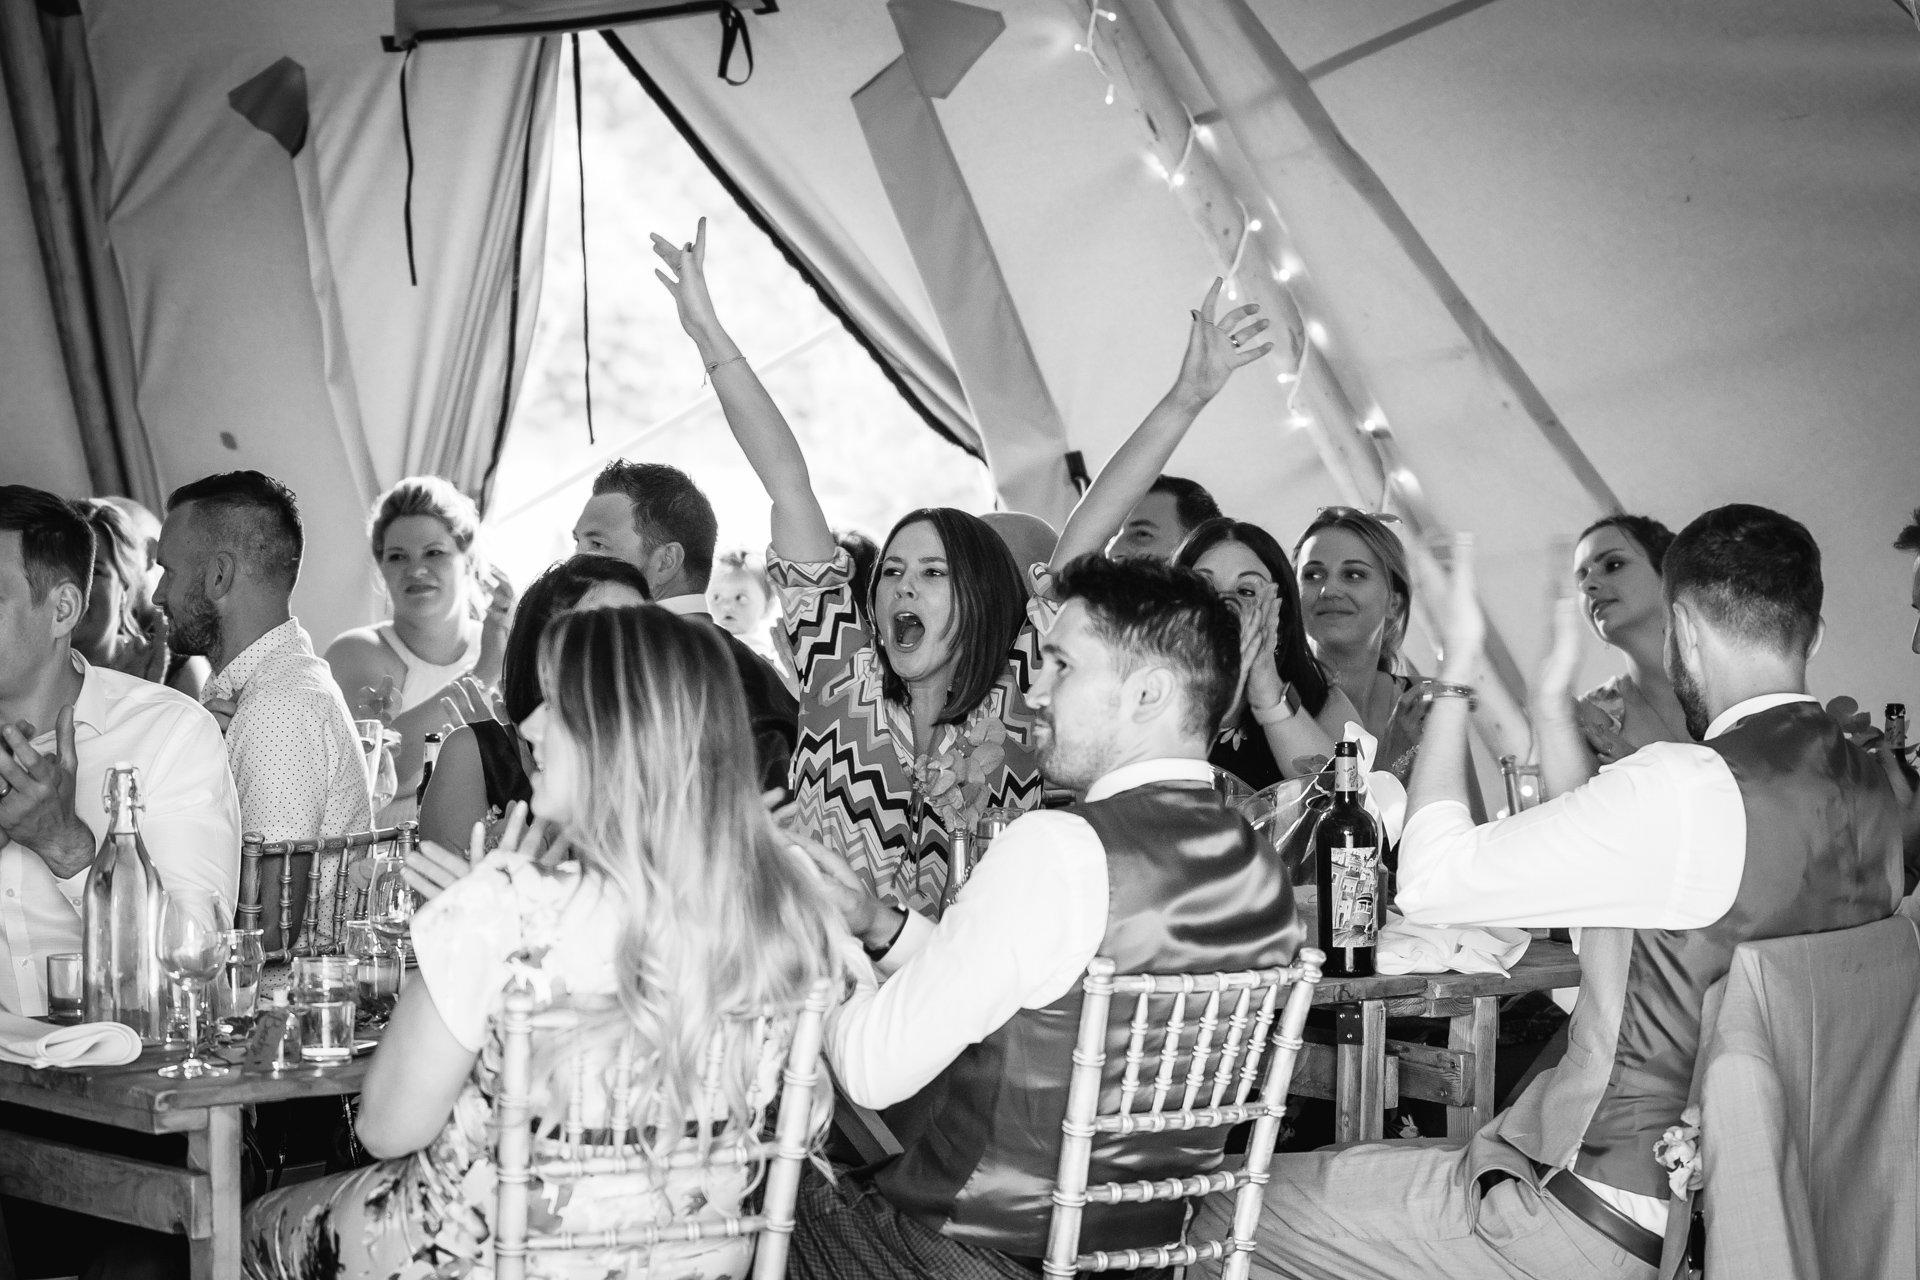 Wedding guest raising arms during wedding speeches